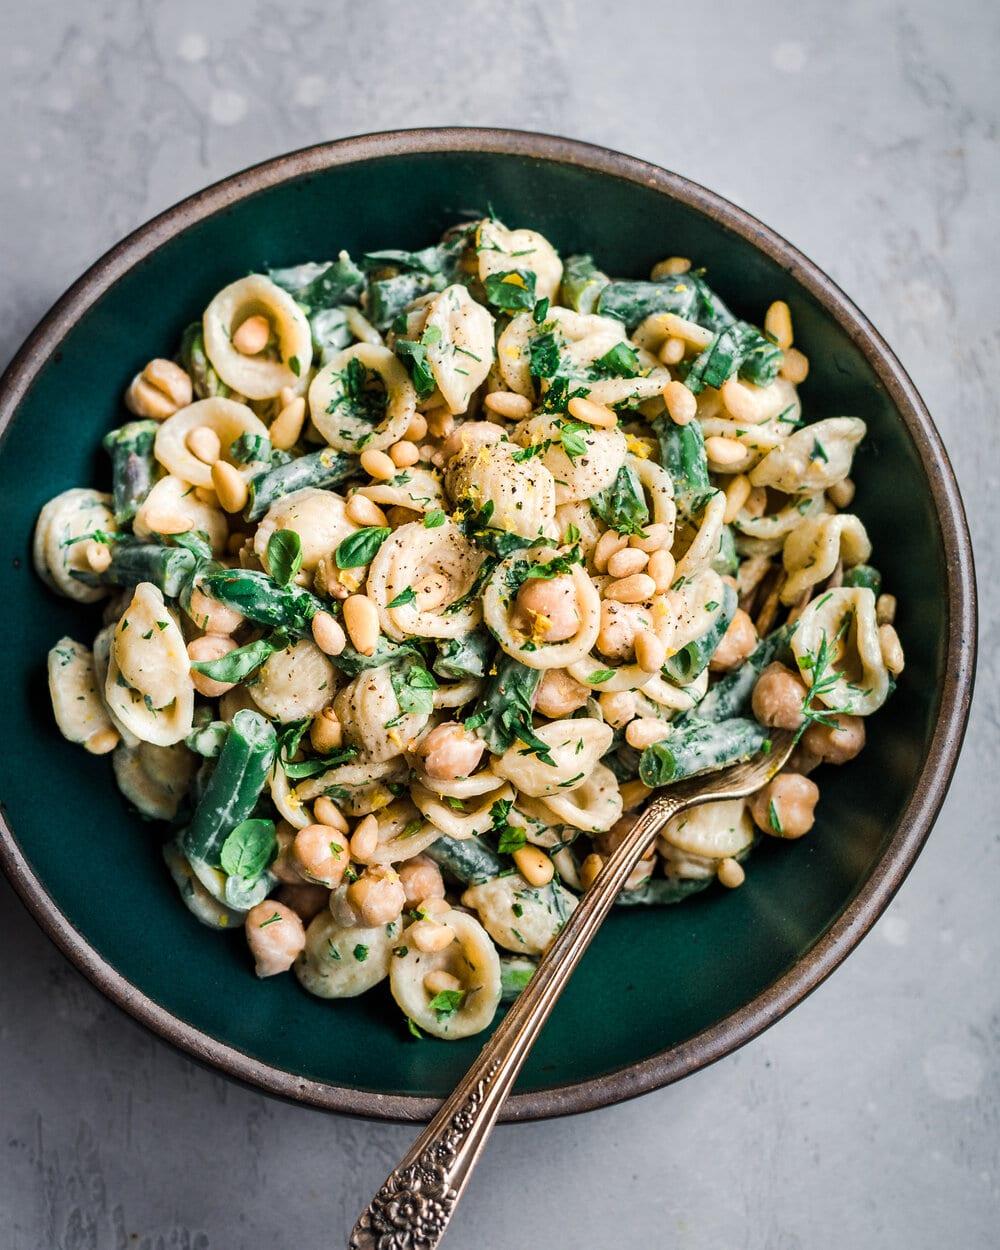 15-Minute Vegan Pasta Recipes for Summer. 15 minute vegan pasta. vegan summer pasta.